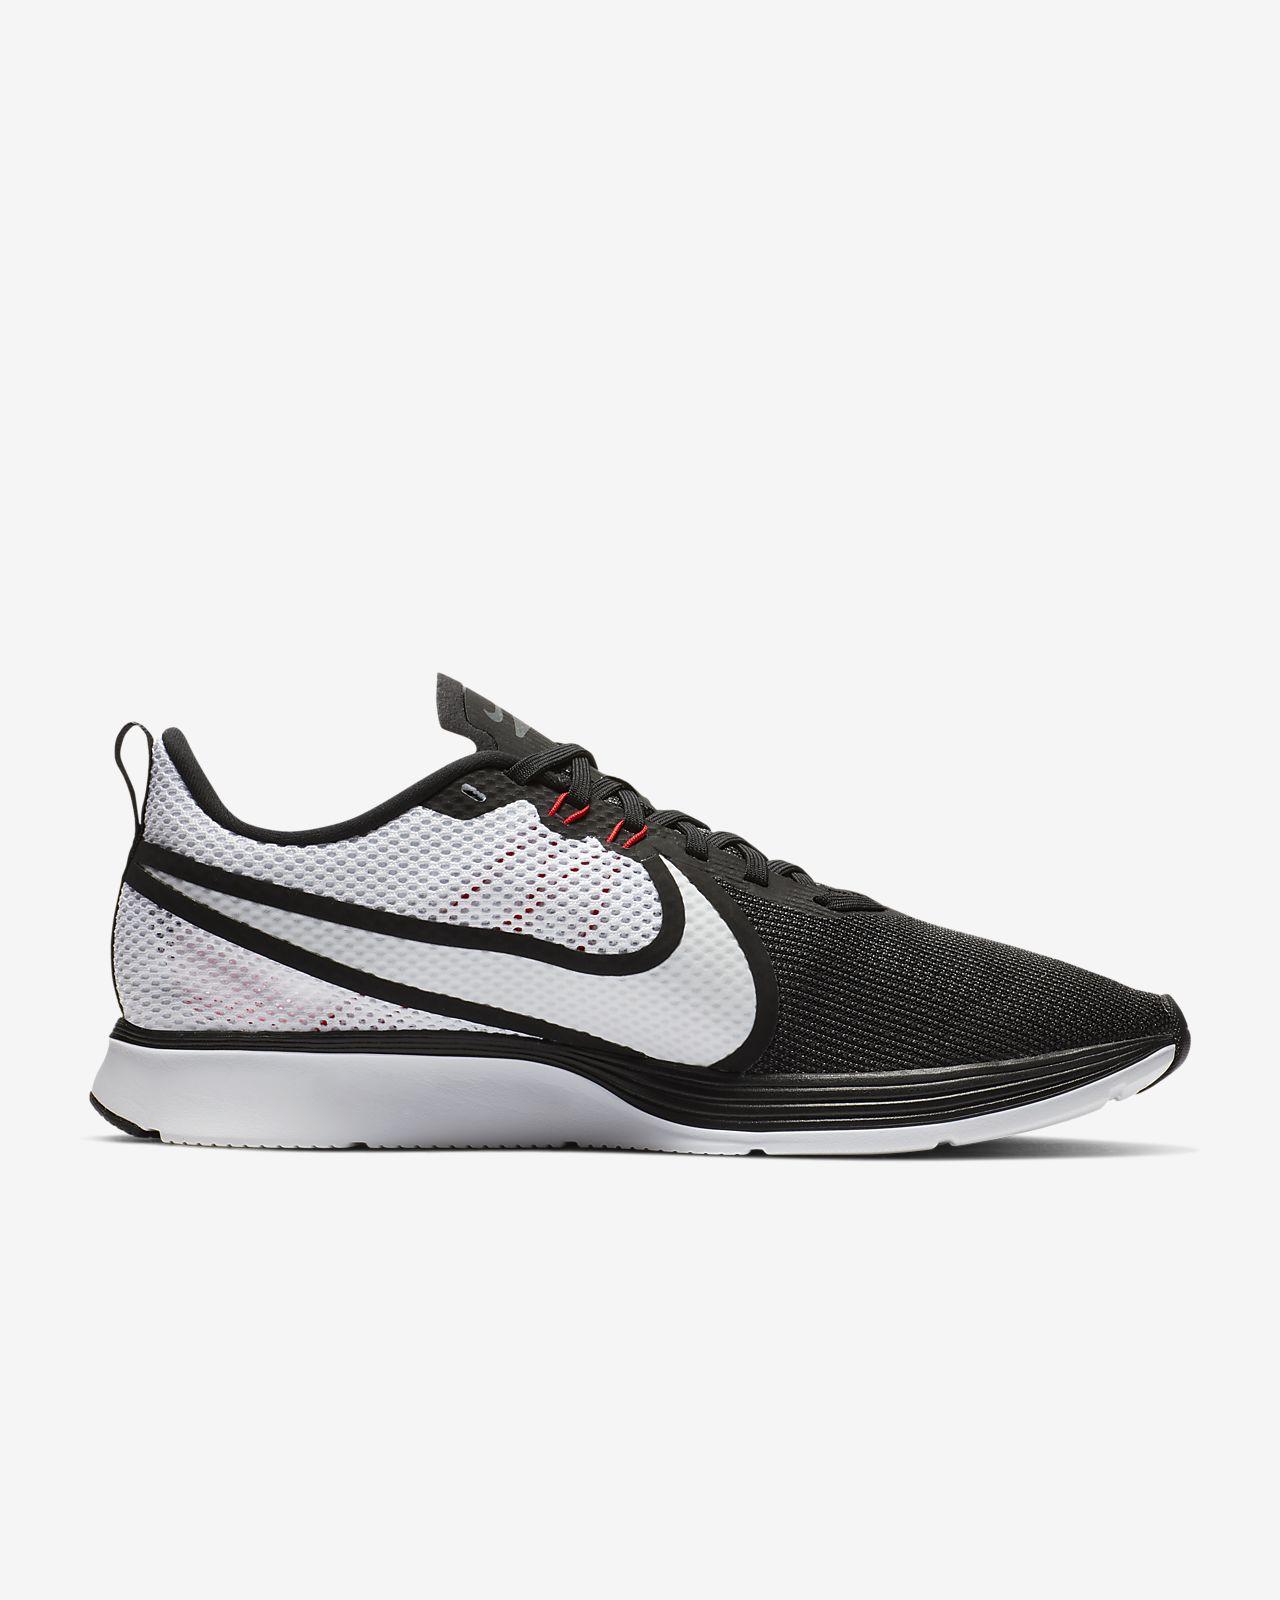 b921f330c36f3 Nike Zoom Strike 2 Men s Running Shoe. Nike.com